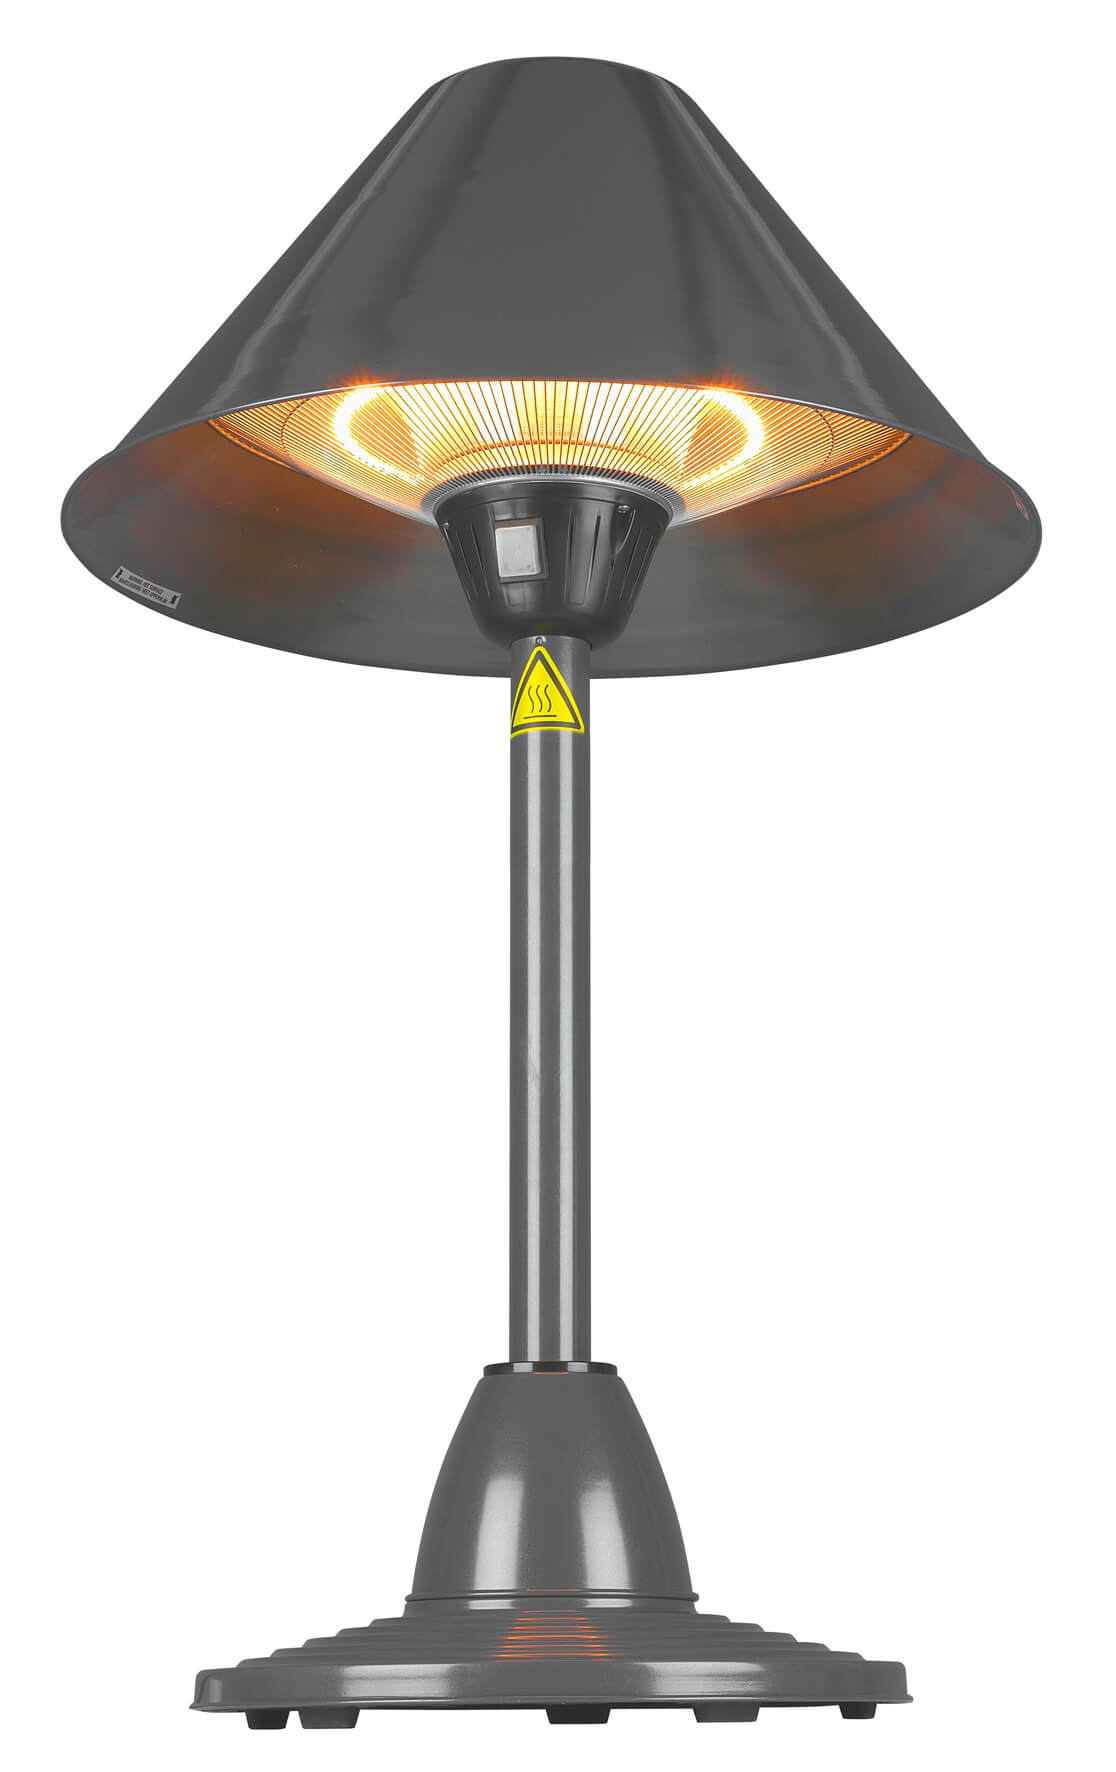 Eurom PD1500T Staande infrarood terrasverwarmer | Tafelmodel halogeen